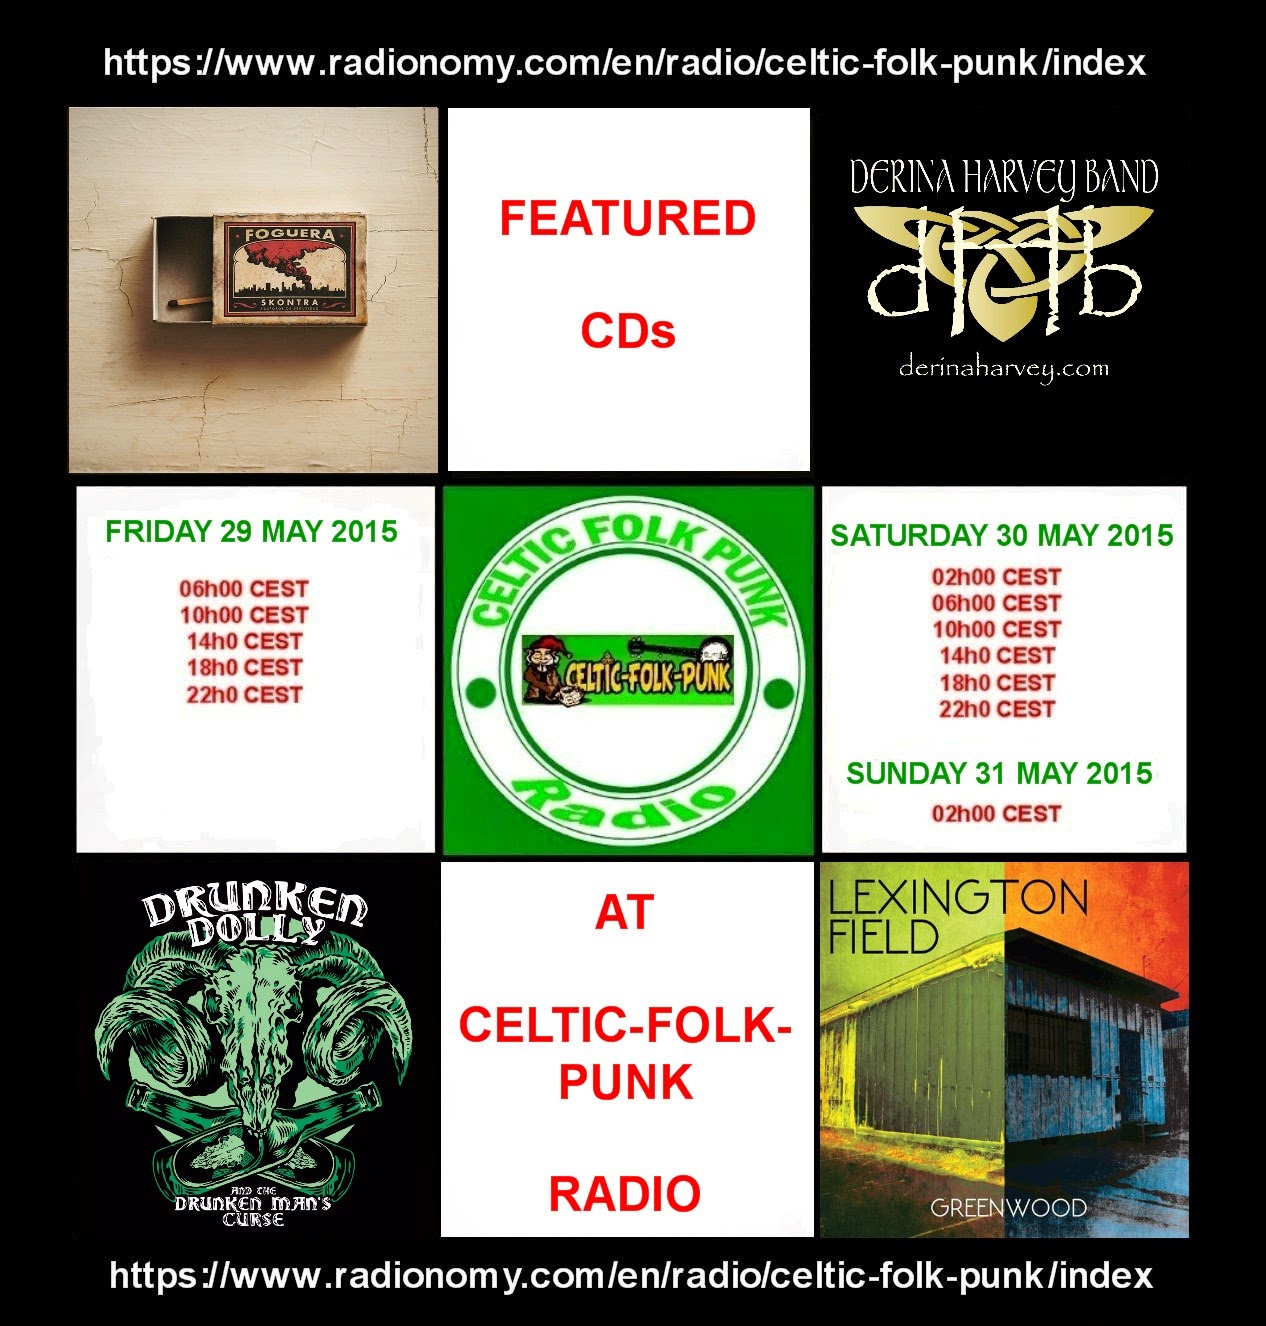 FEATURED CDs AT CELTIC-FOLK-PUNK RADIO (29-30 May 2015 ...